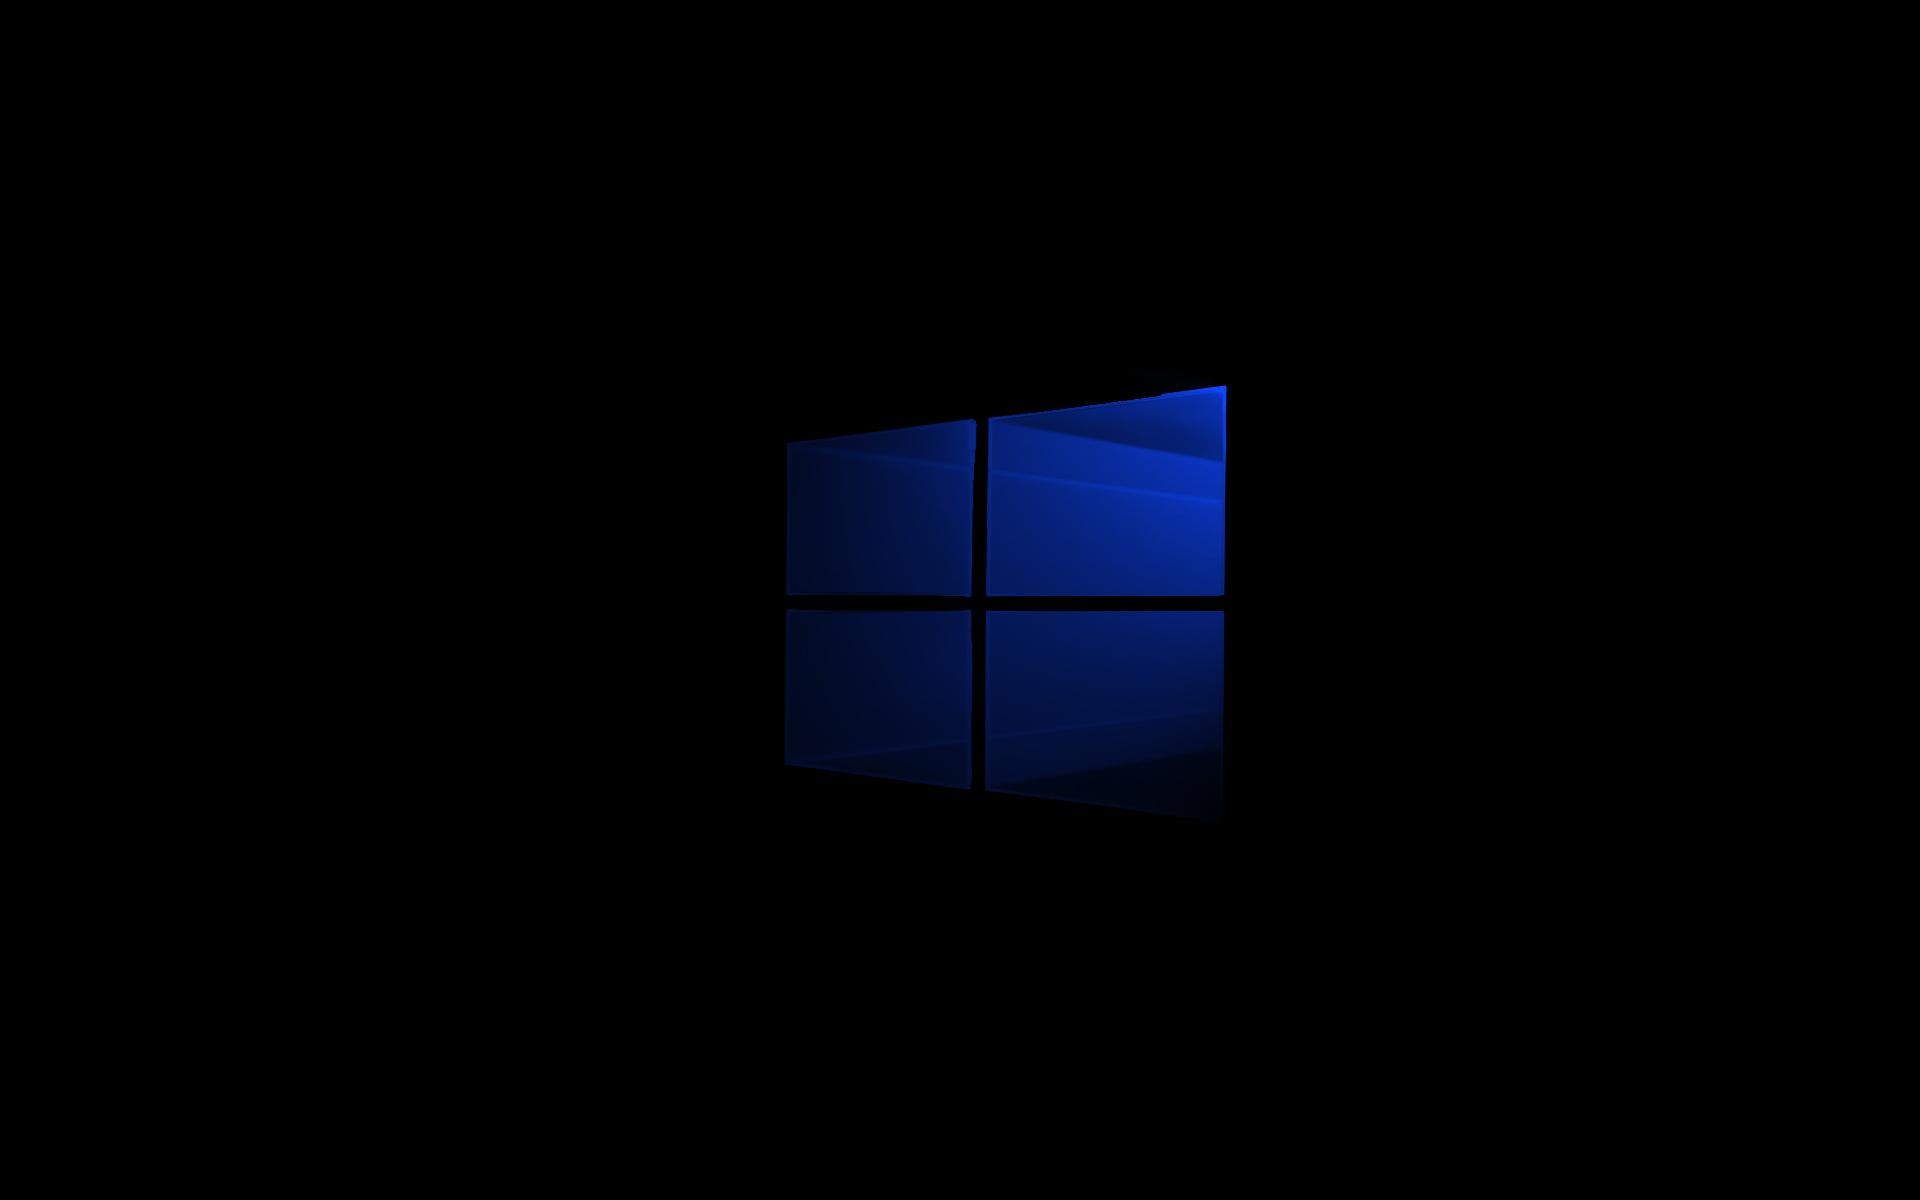 Minimal Windows 10 wallpaper by arcadiogarcia 1920x1200